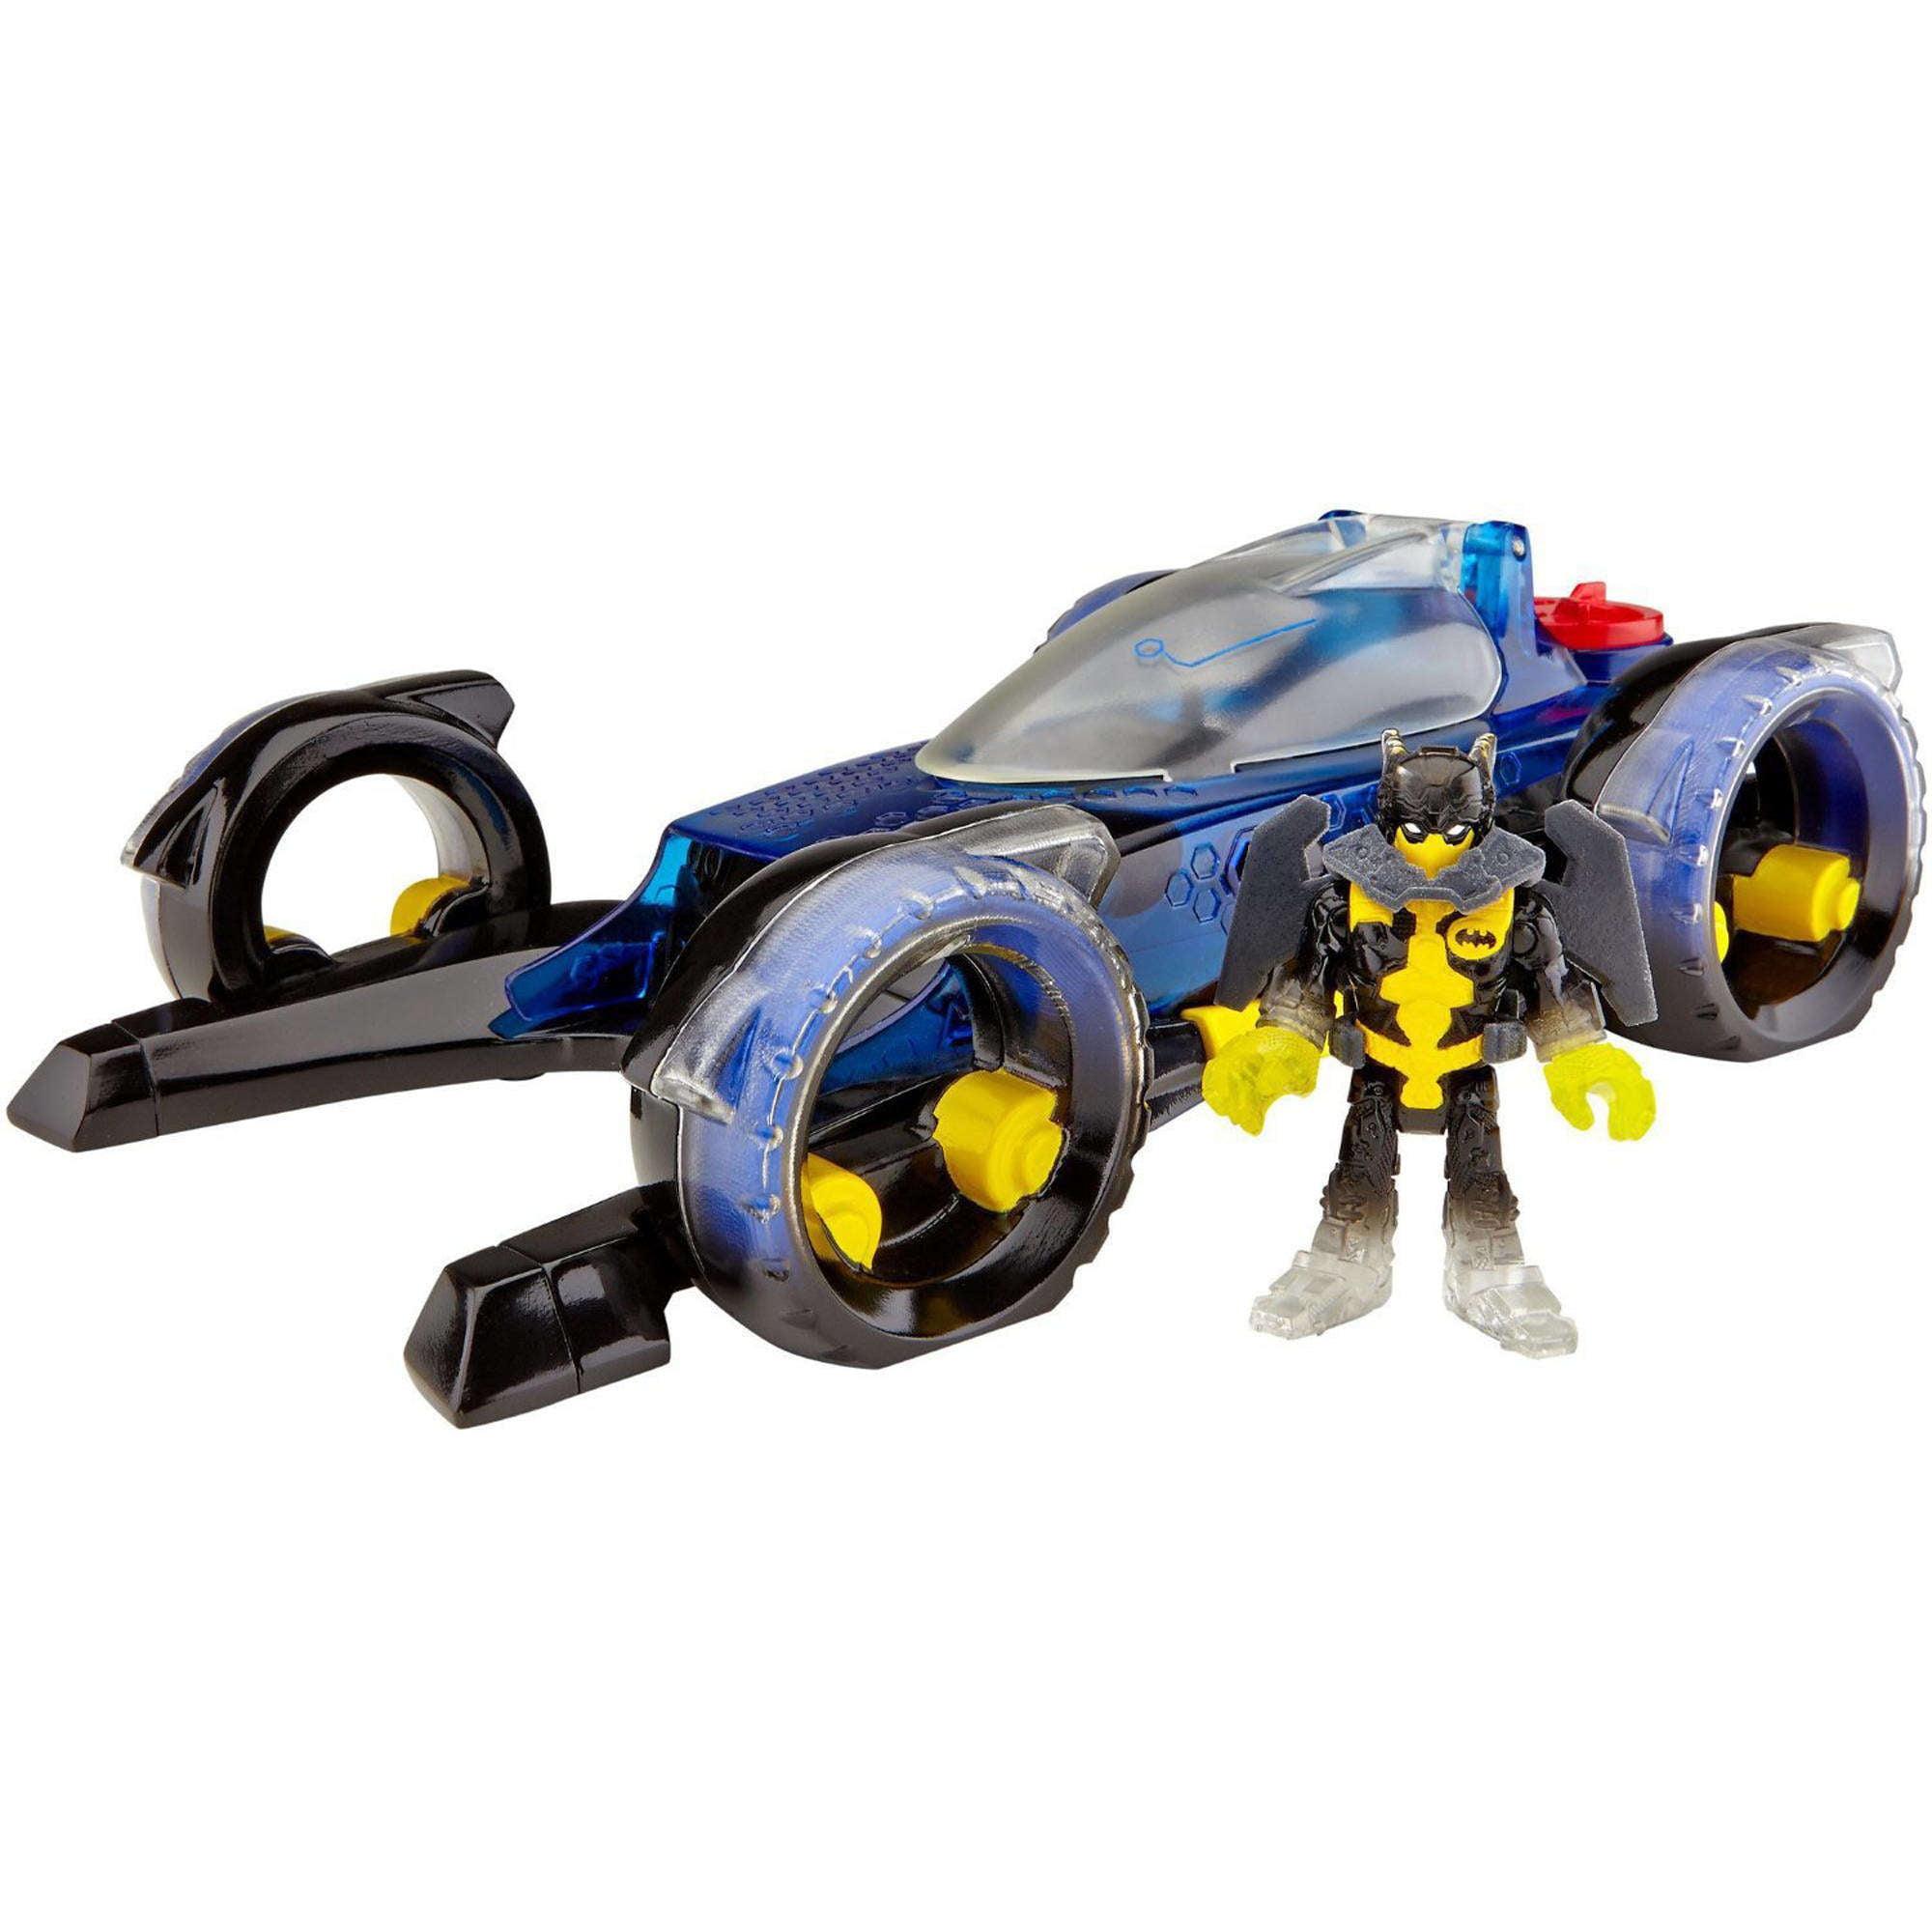 Imaginext DC Super Friends Transforming Batmobile